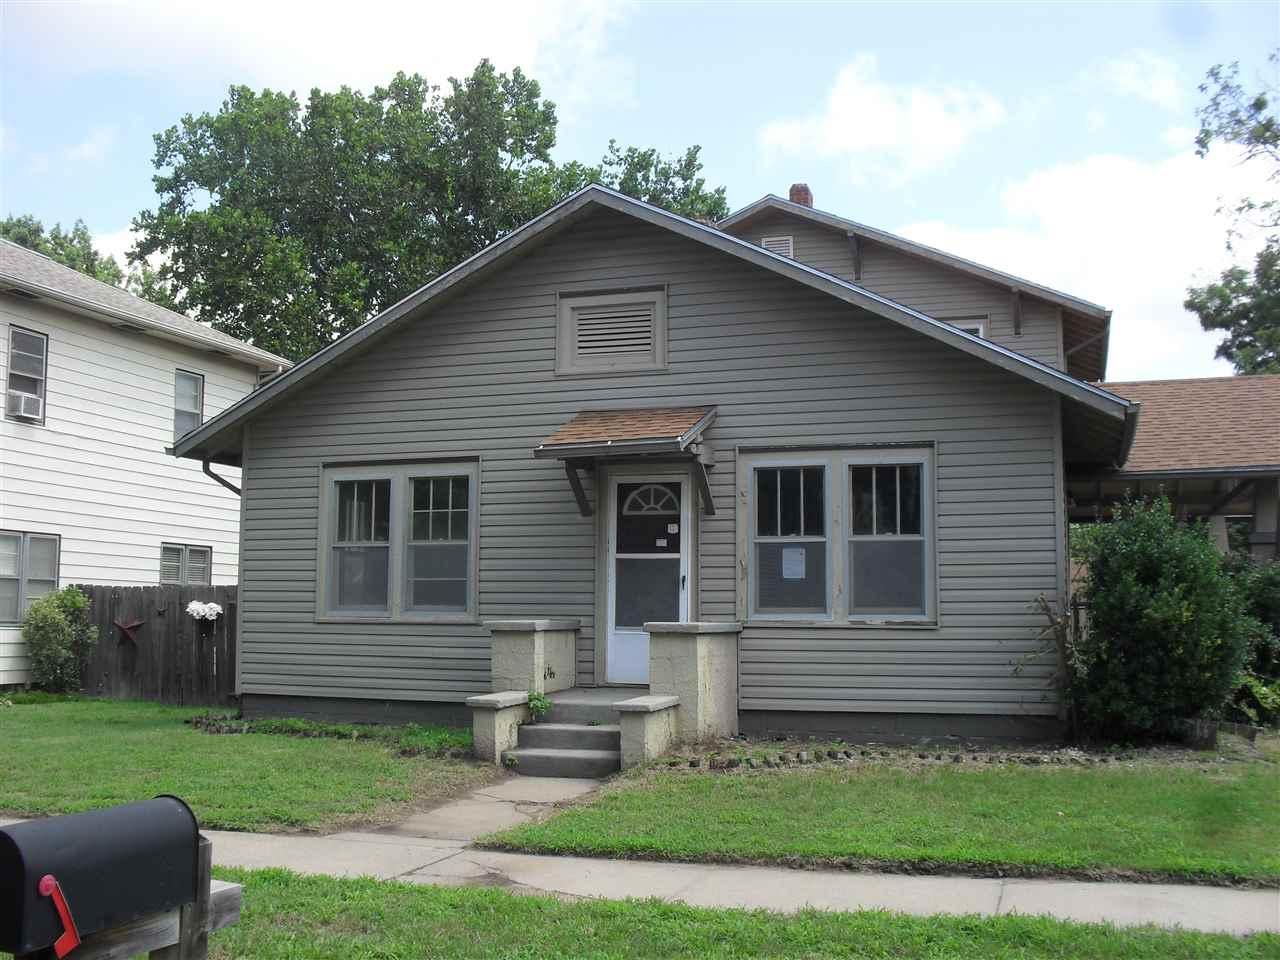 502 N 3rd, Arkansas City, KS 67005